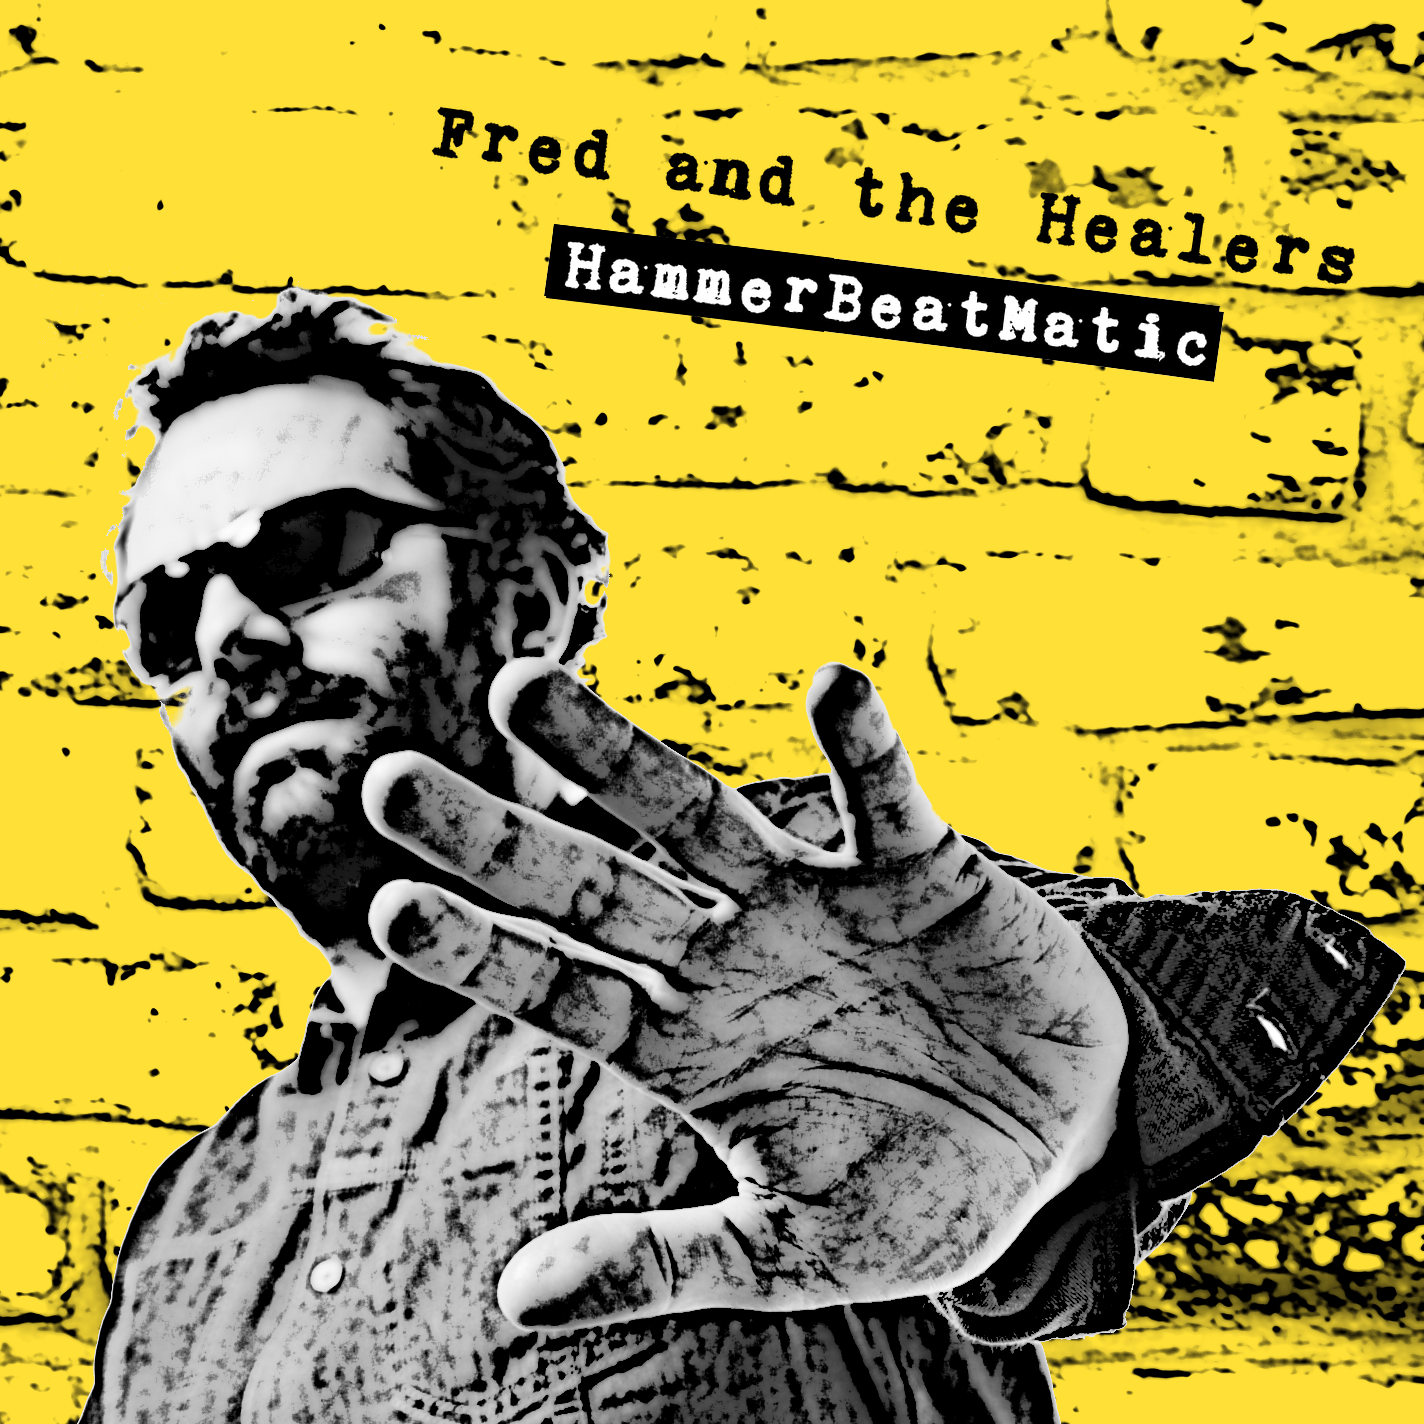 Fred & The Healers